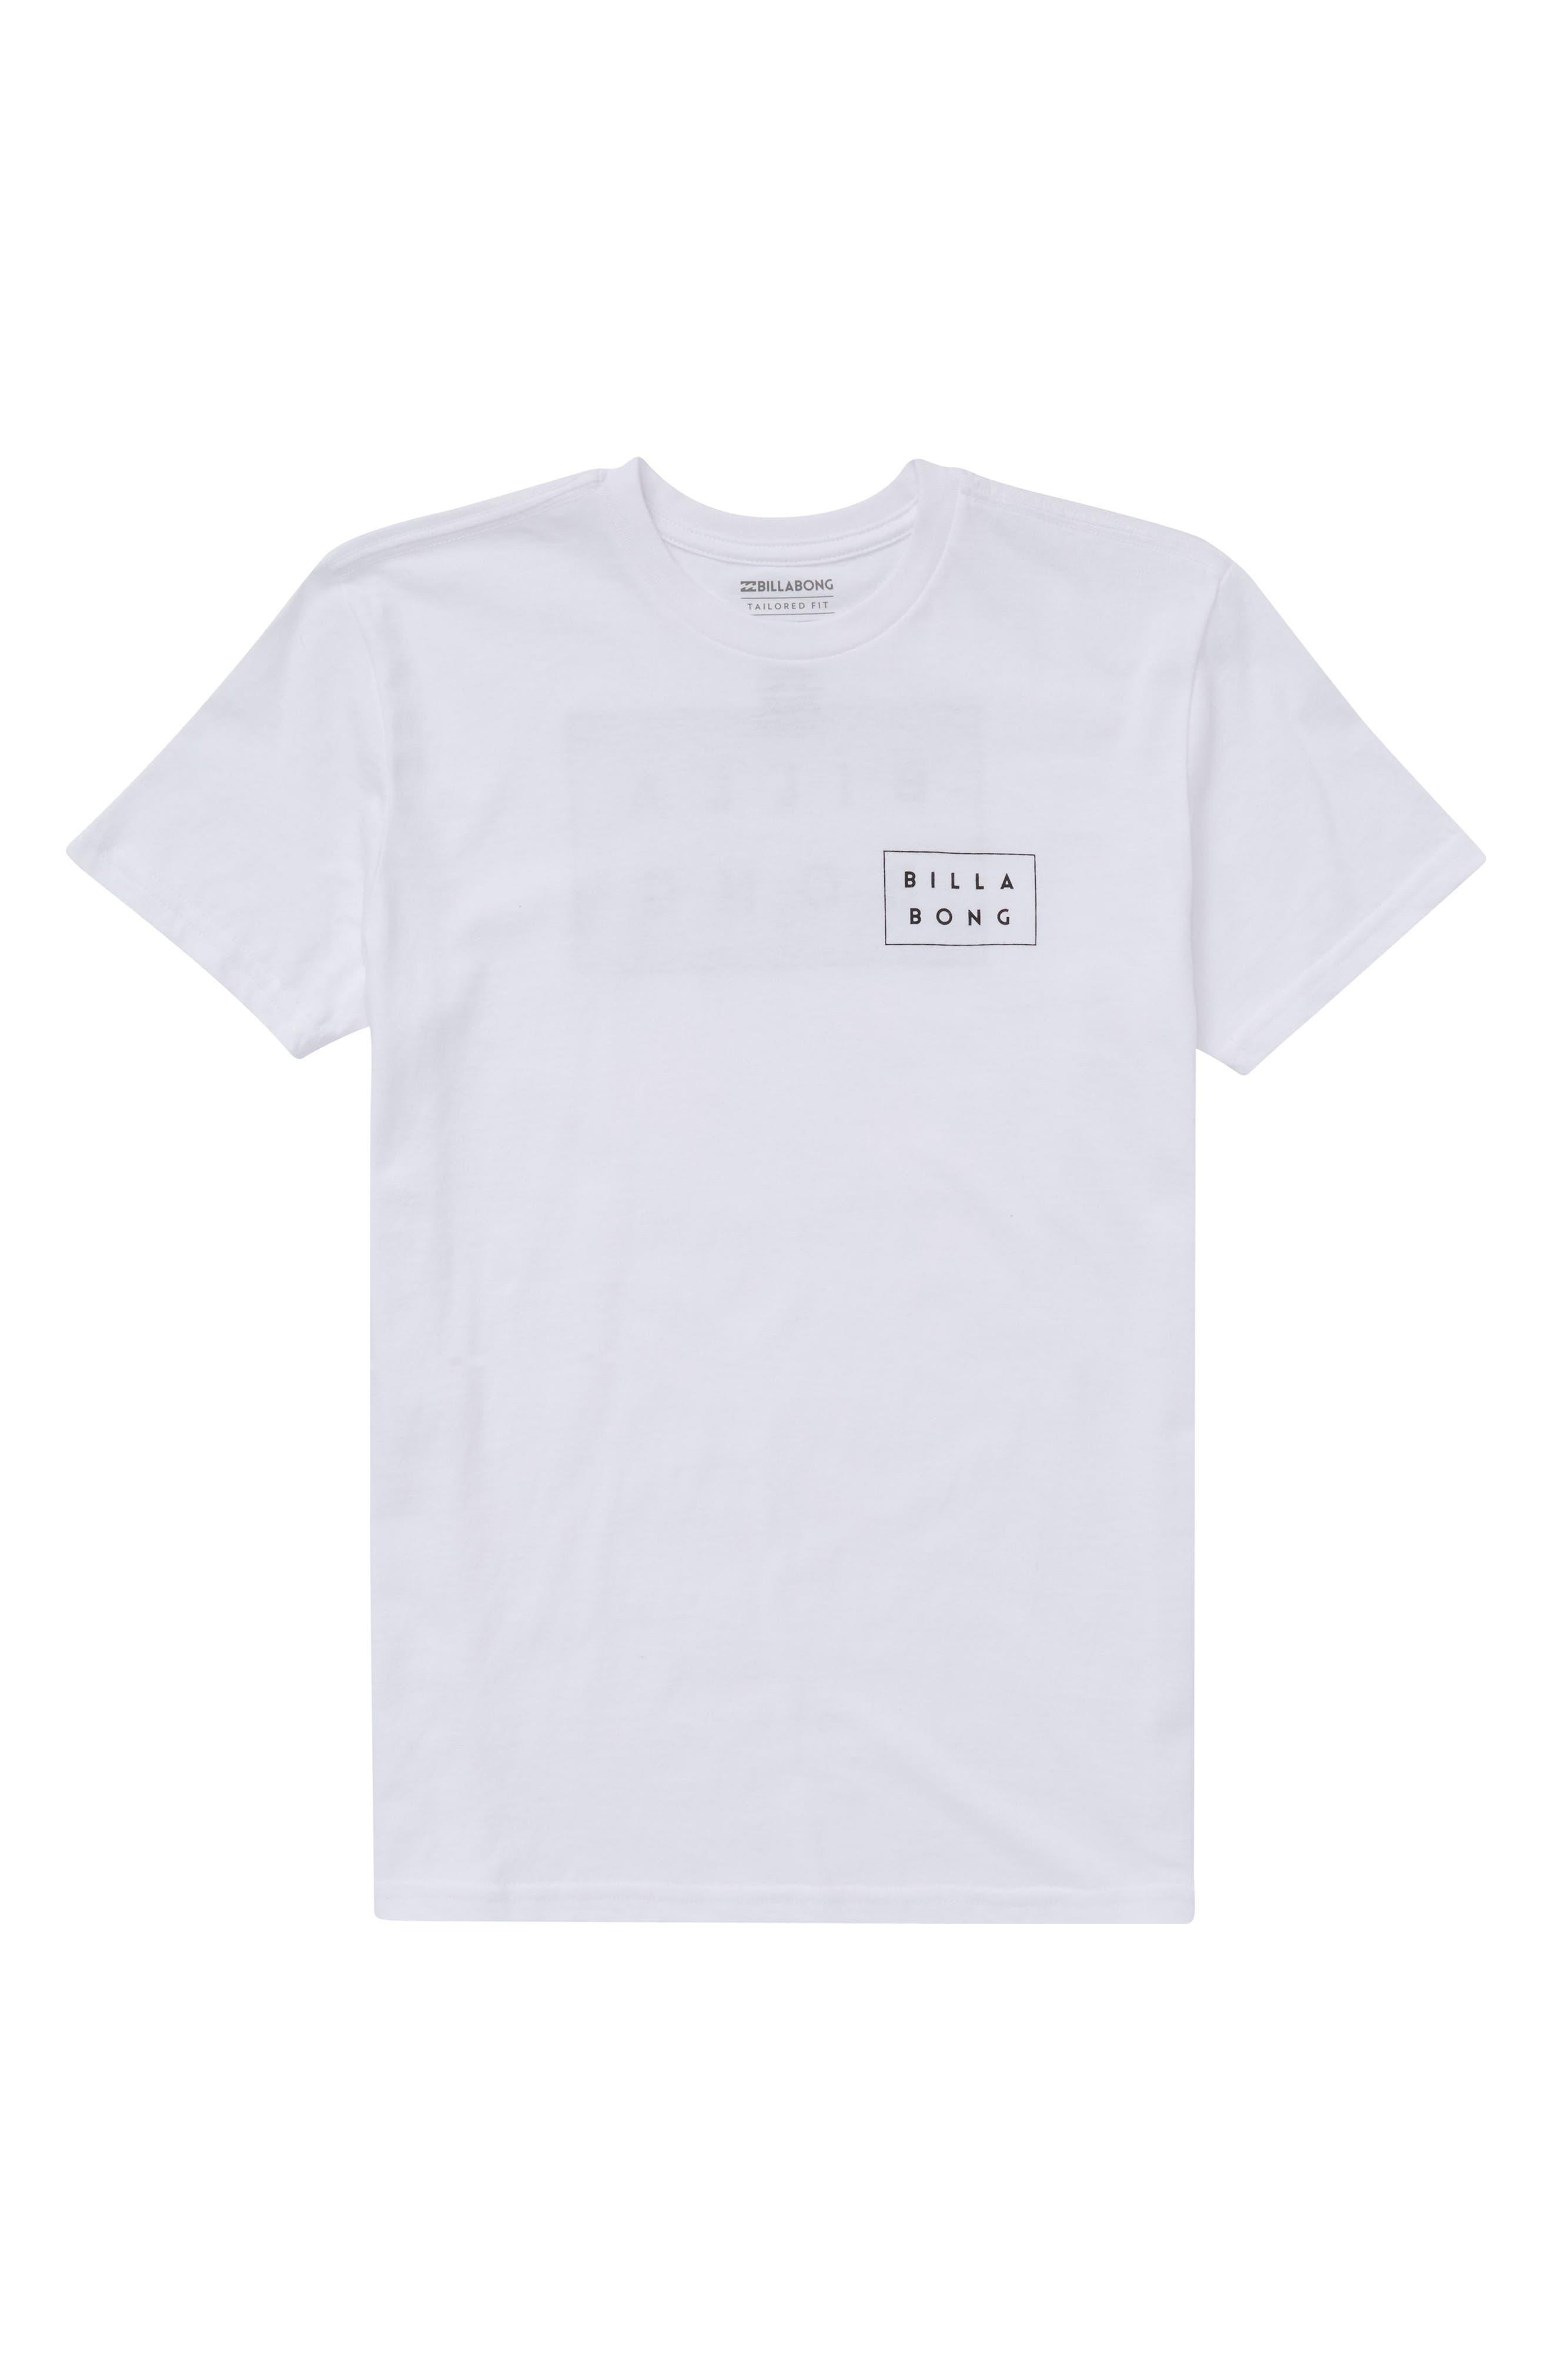 Die Cut Graphic T-Shirt,                             Main thumbnail 1, color,                             White